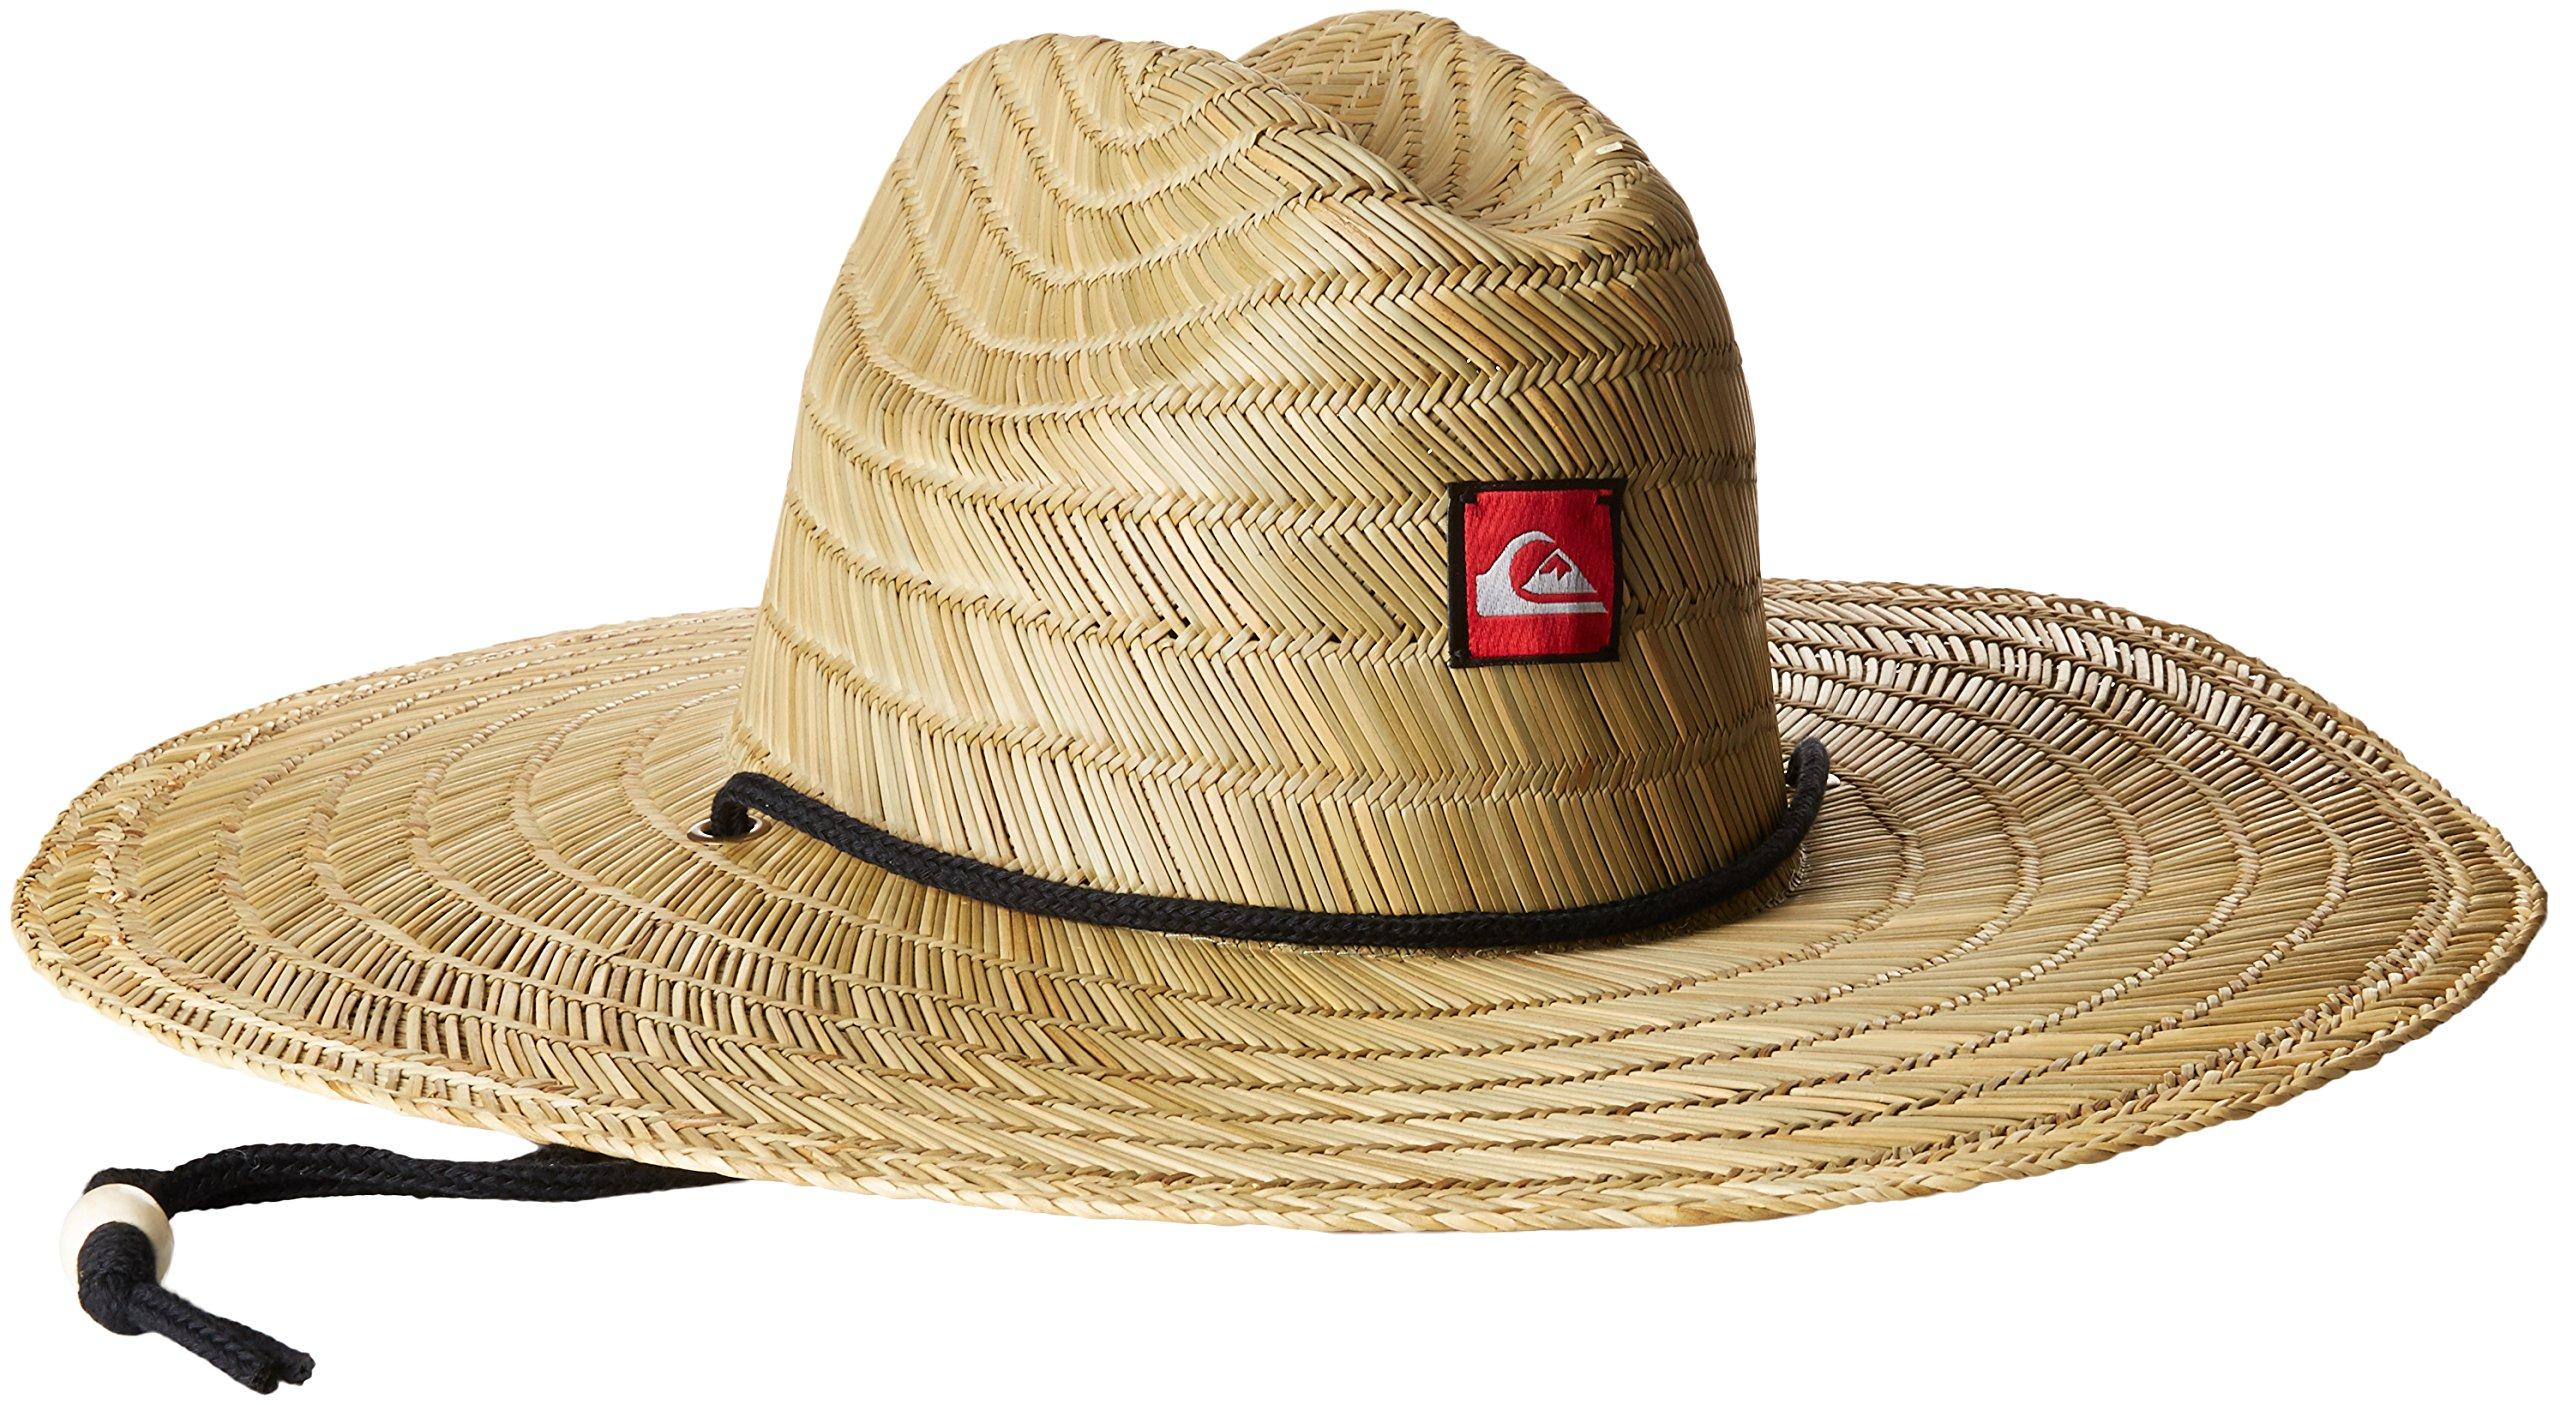 491b8f1de9af93 Quiksilver Men's Pierside Straw Hat, Natural, Large/X-Large